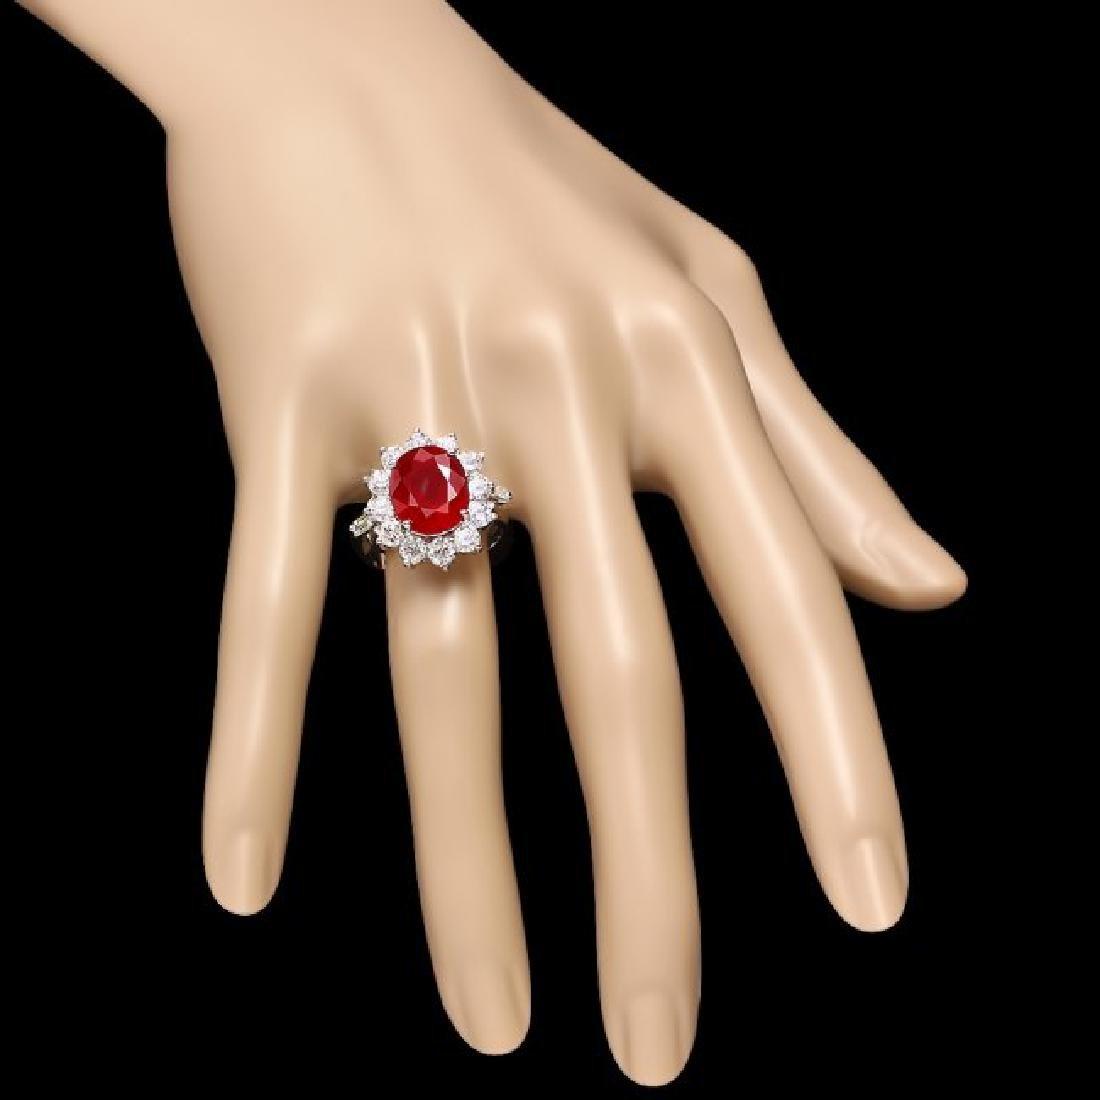 14k White Gold 7.00ct Ruby 2.3ct Diamond Ring - 4